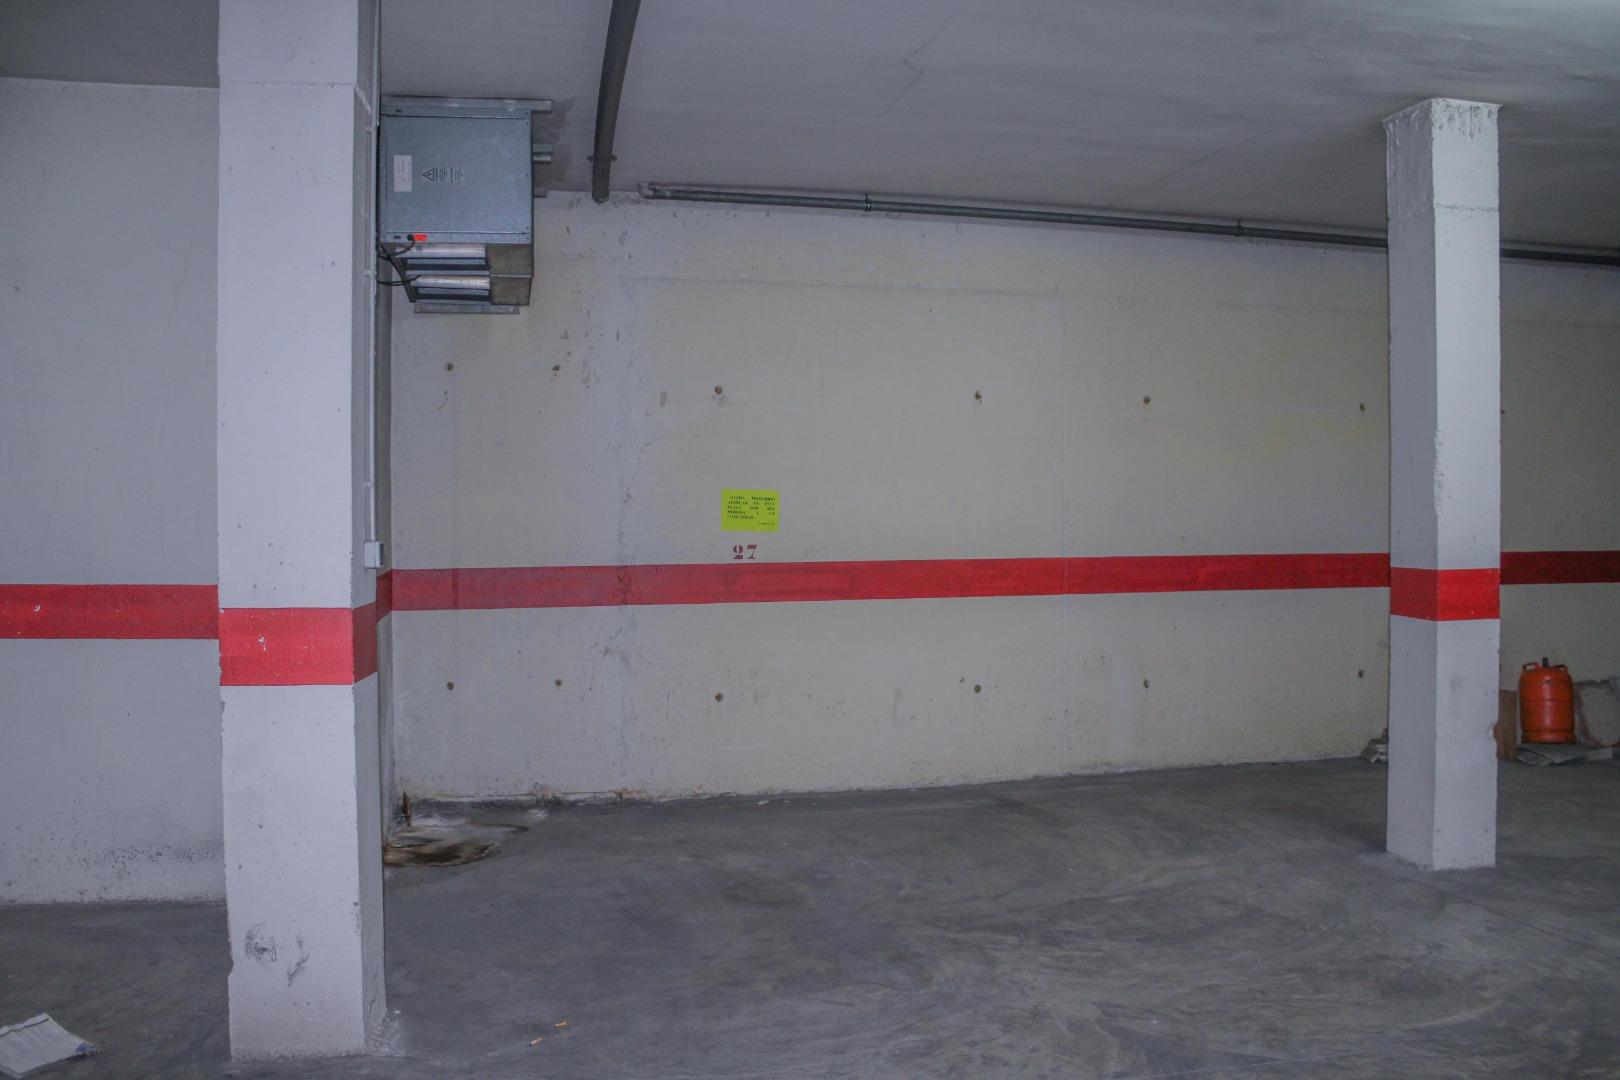 Parking voiture  Calle ribera. Plaza de garaje en Cheste